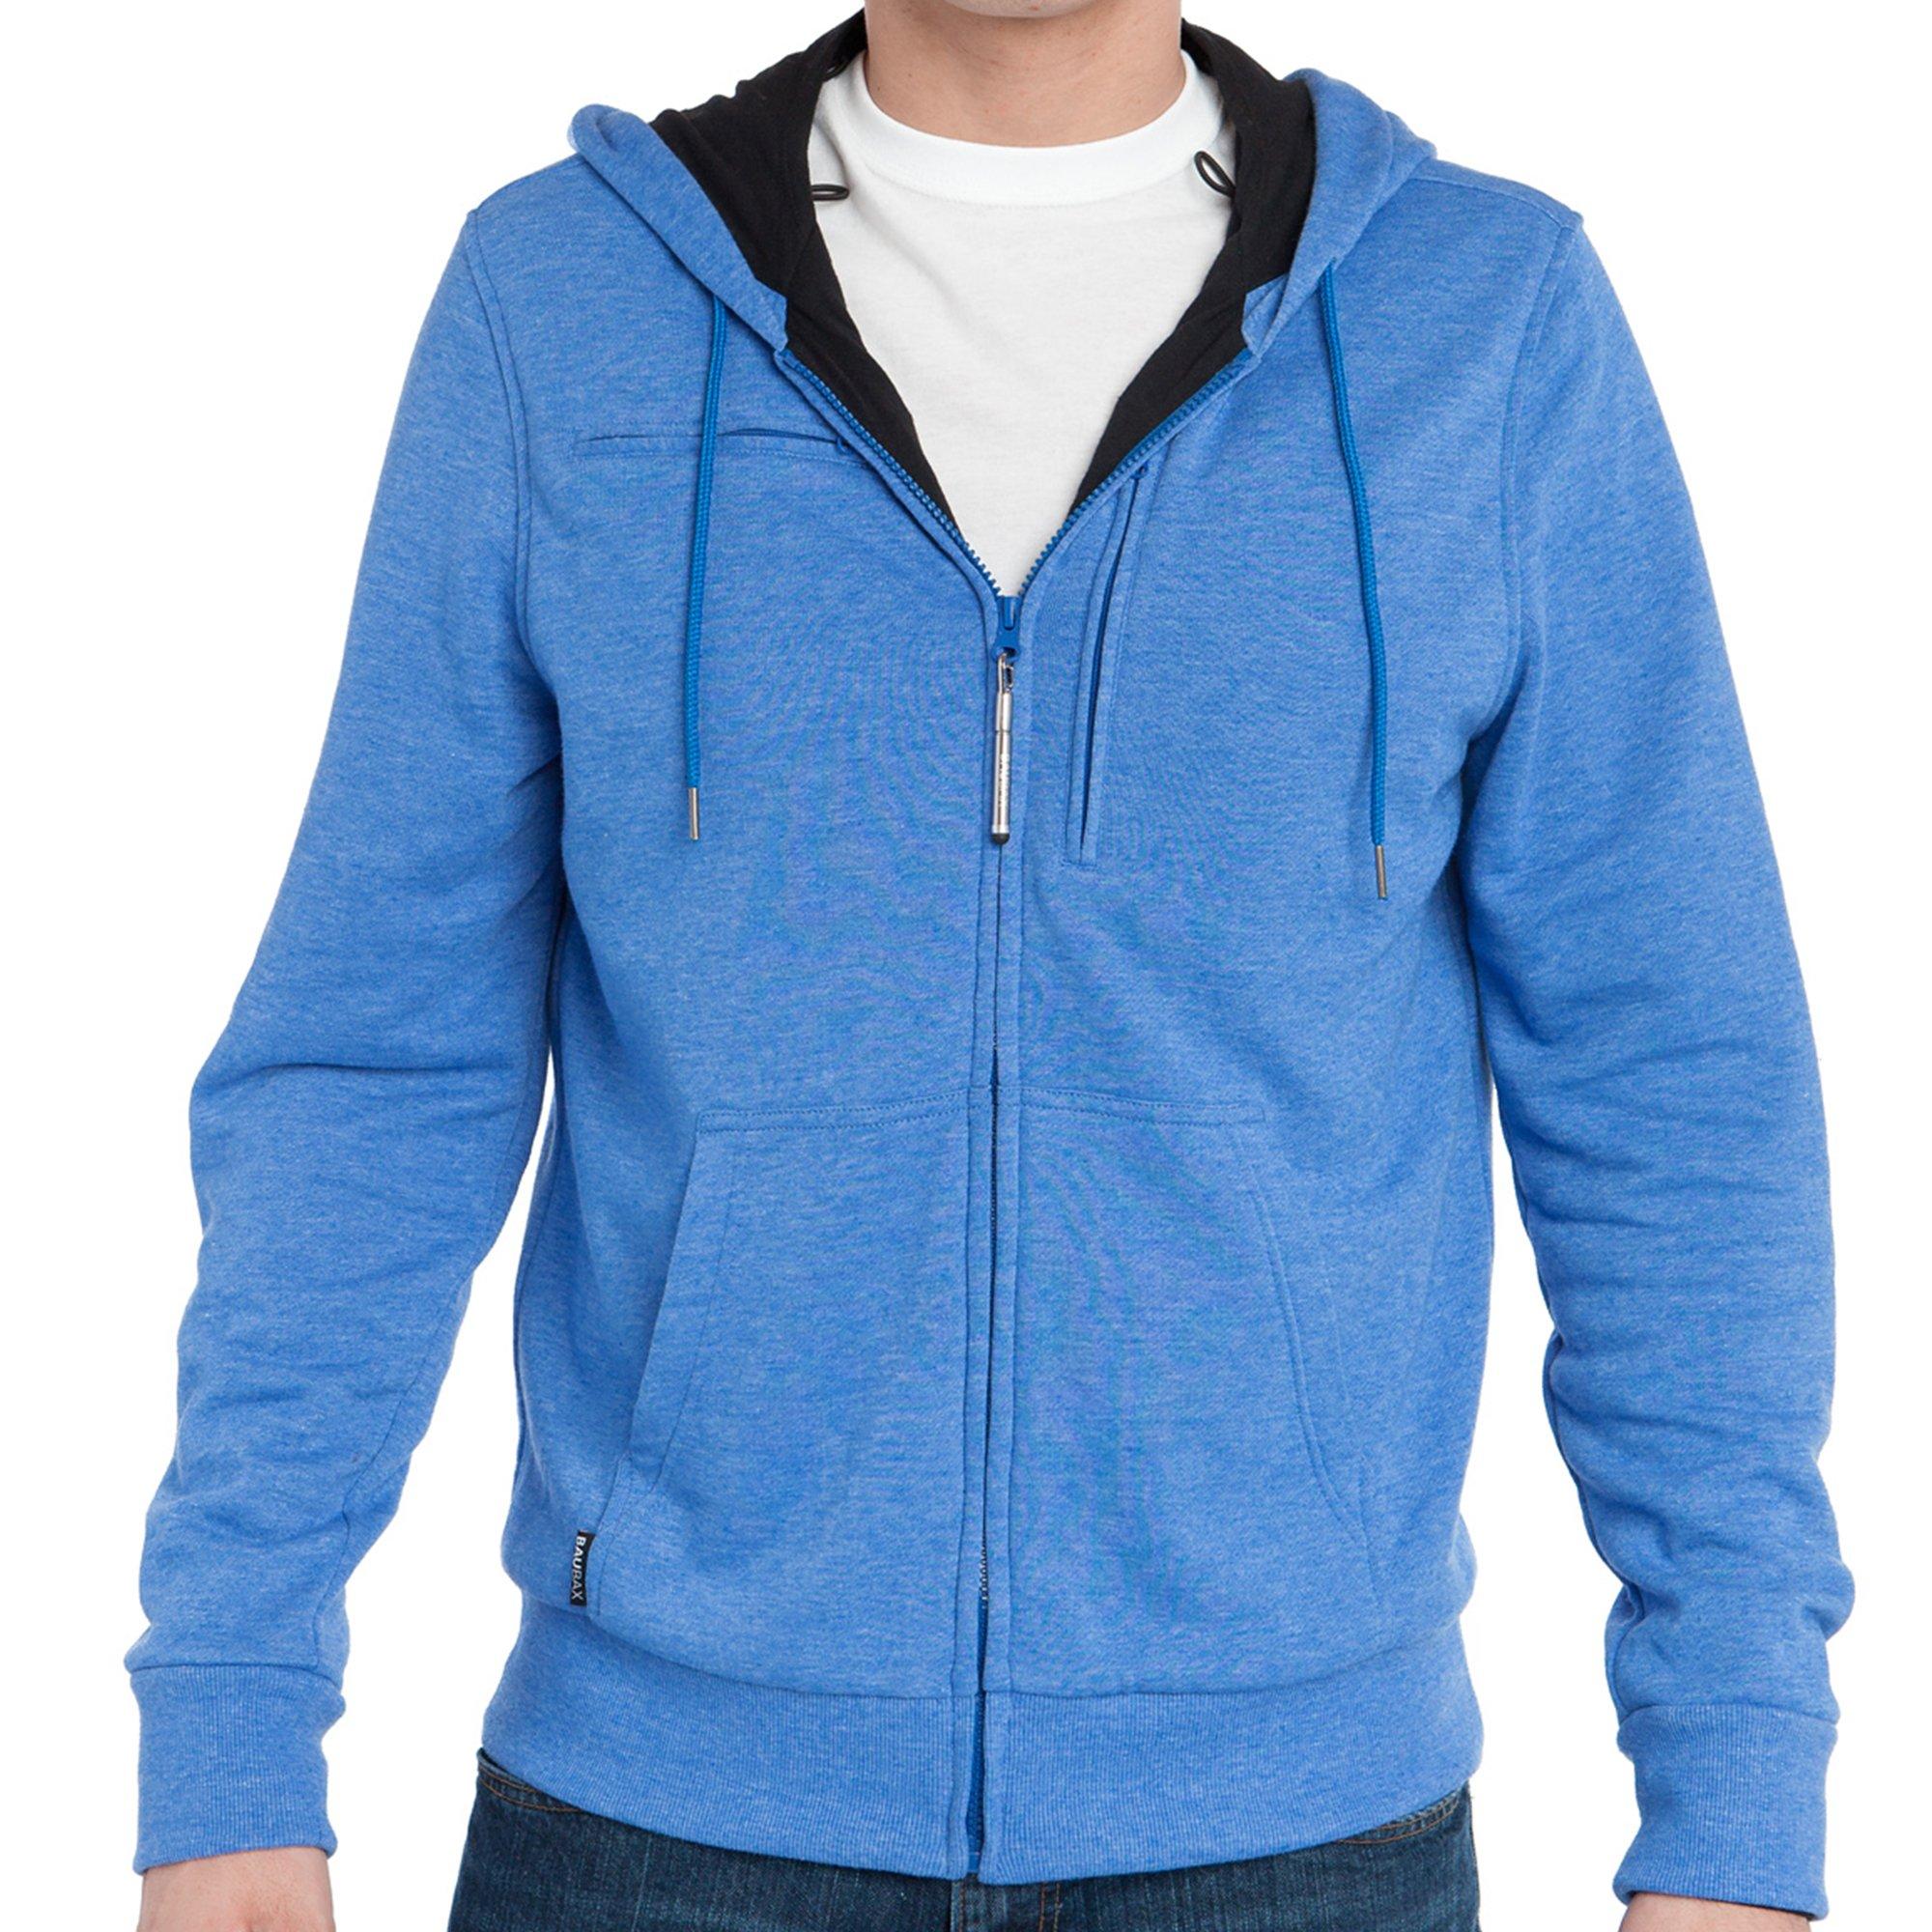 Baubax Travel Jacket - Sweatshirt - Male - Blue - Medium